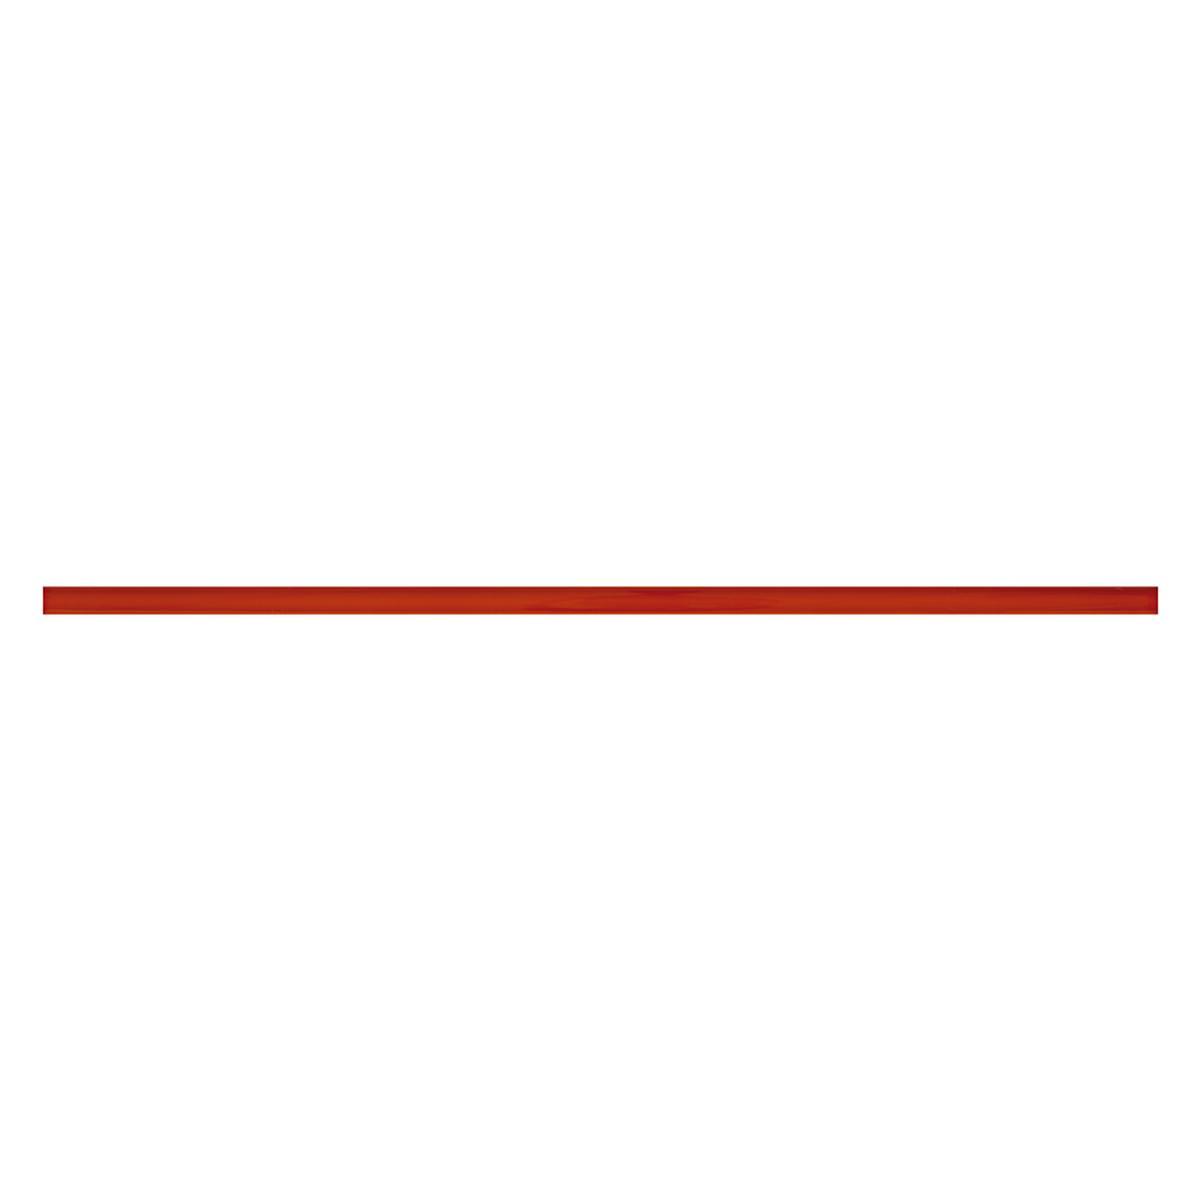 Lapiz Rojo Brillante - 39X1 cm - 1 pza